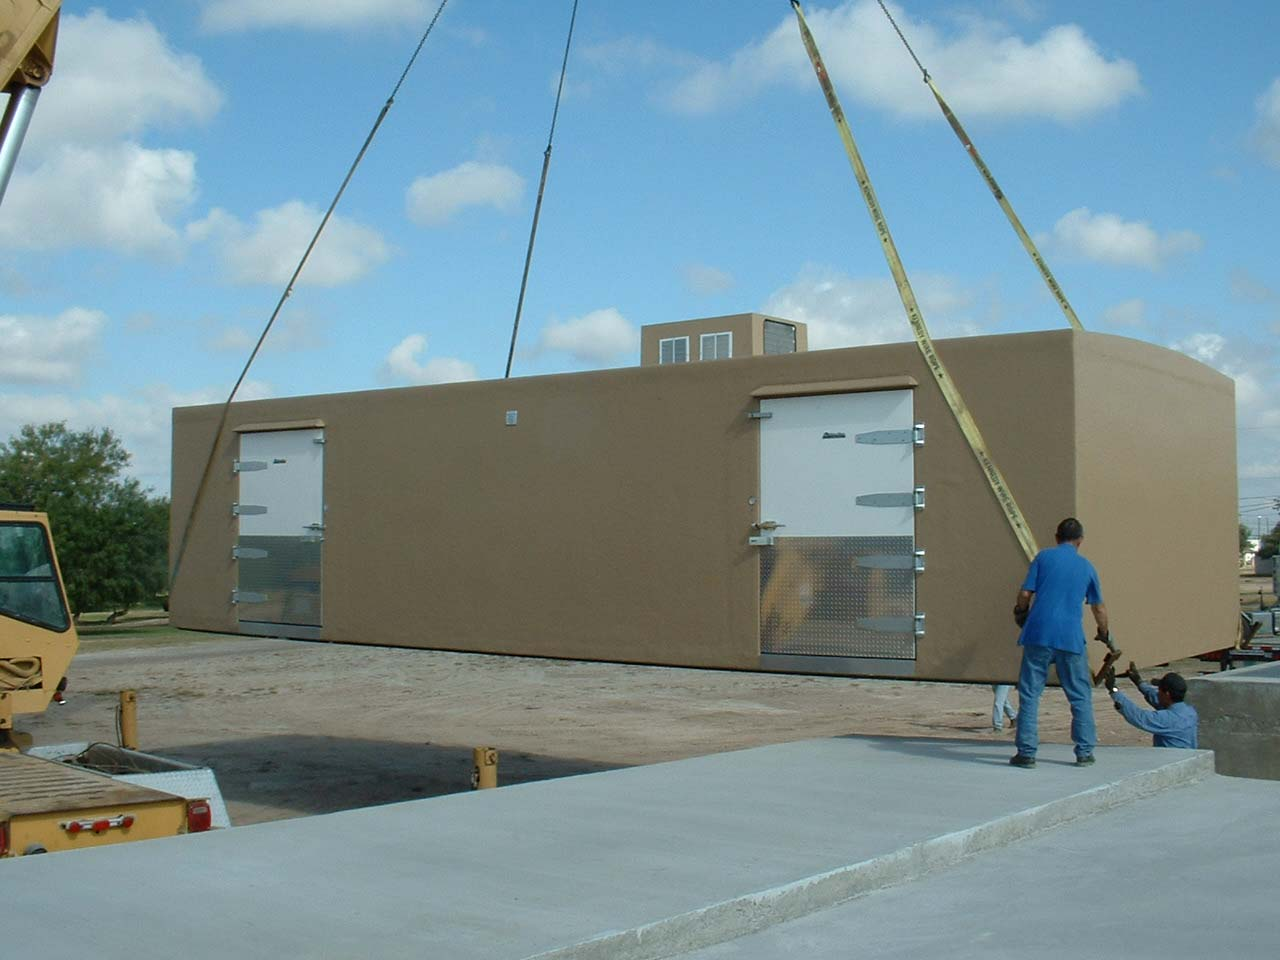 Tan Polar King walk-in cooler unit being delivered